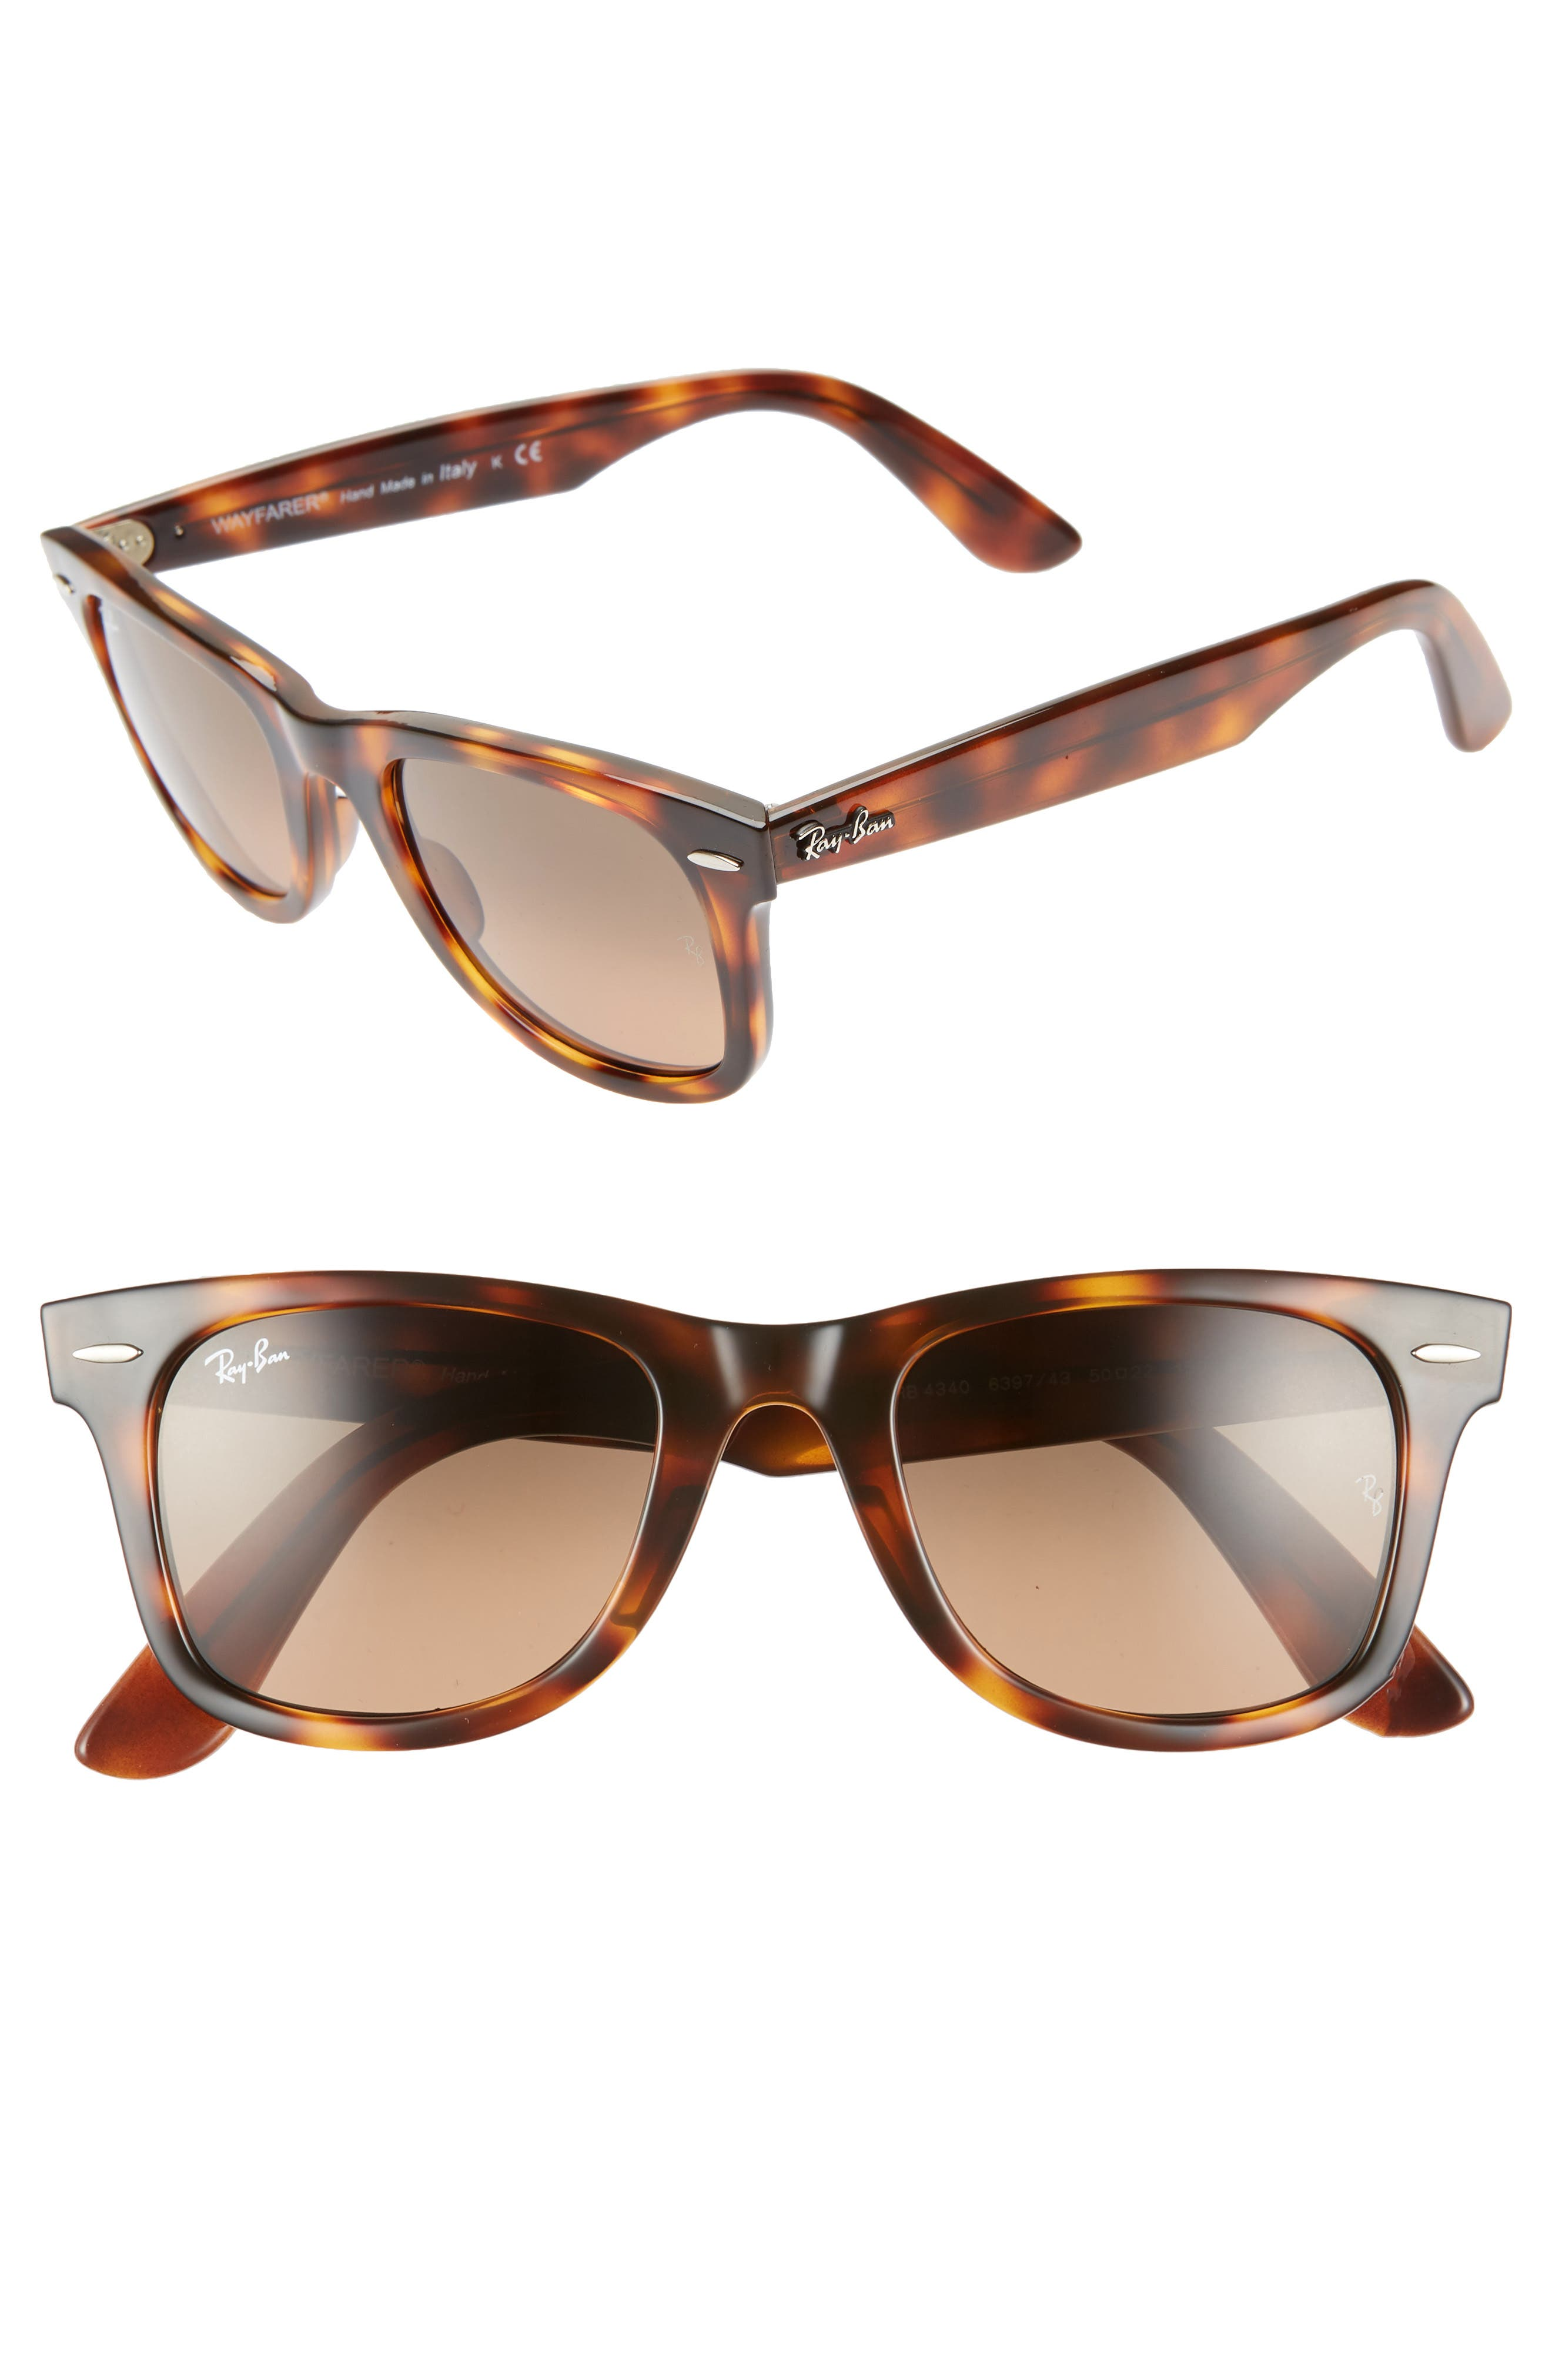 Ray-Ban Wayfarer 50Mm Gradient Sunglasses - Brown/ Grey